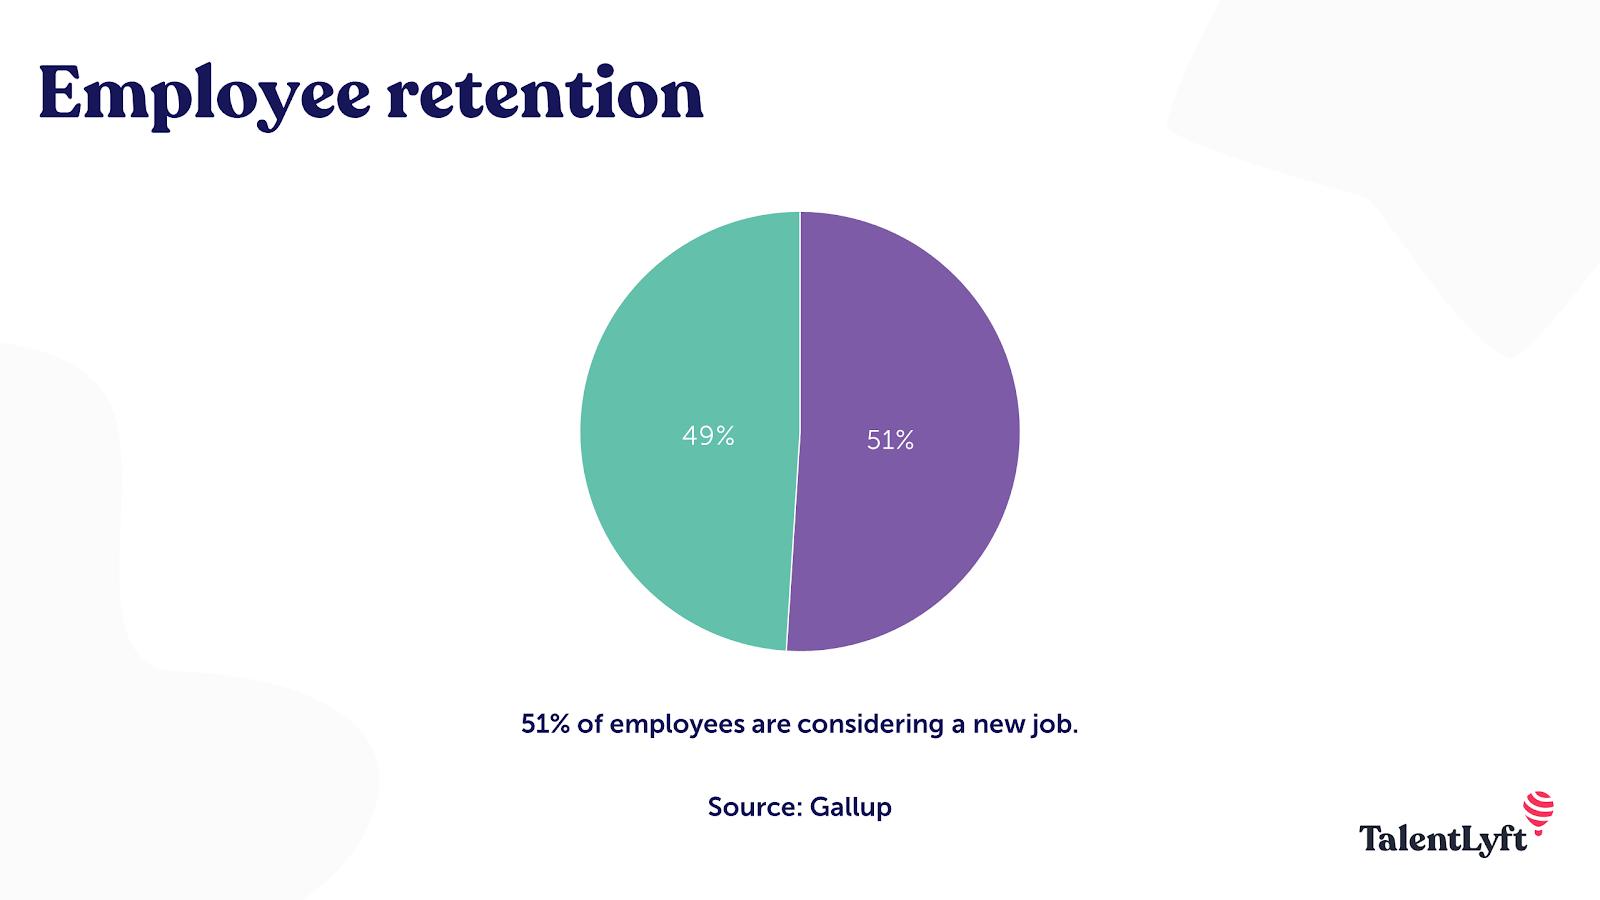 Employee retention statistic